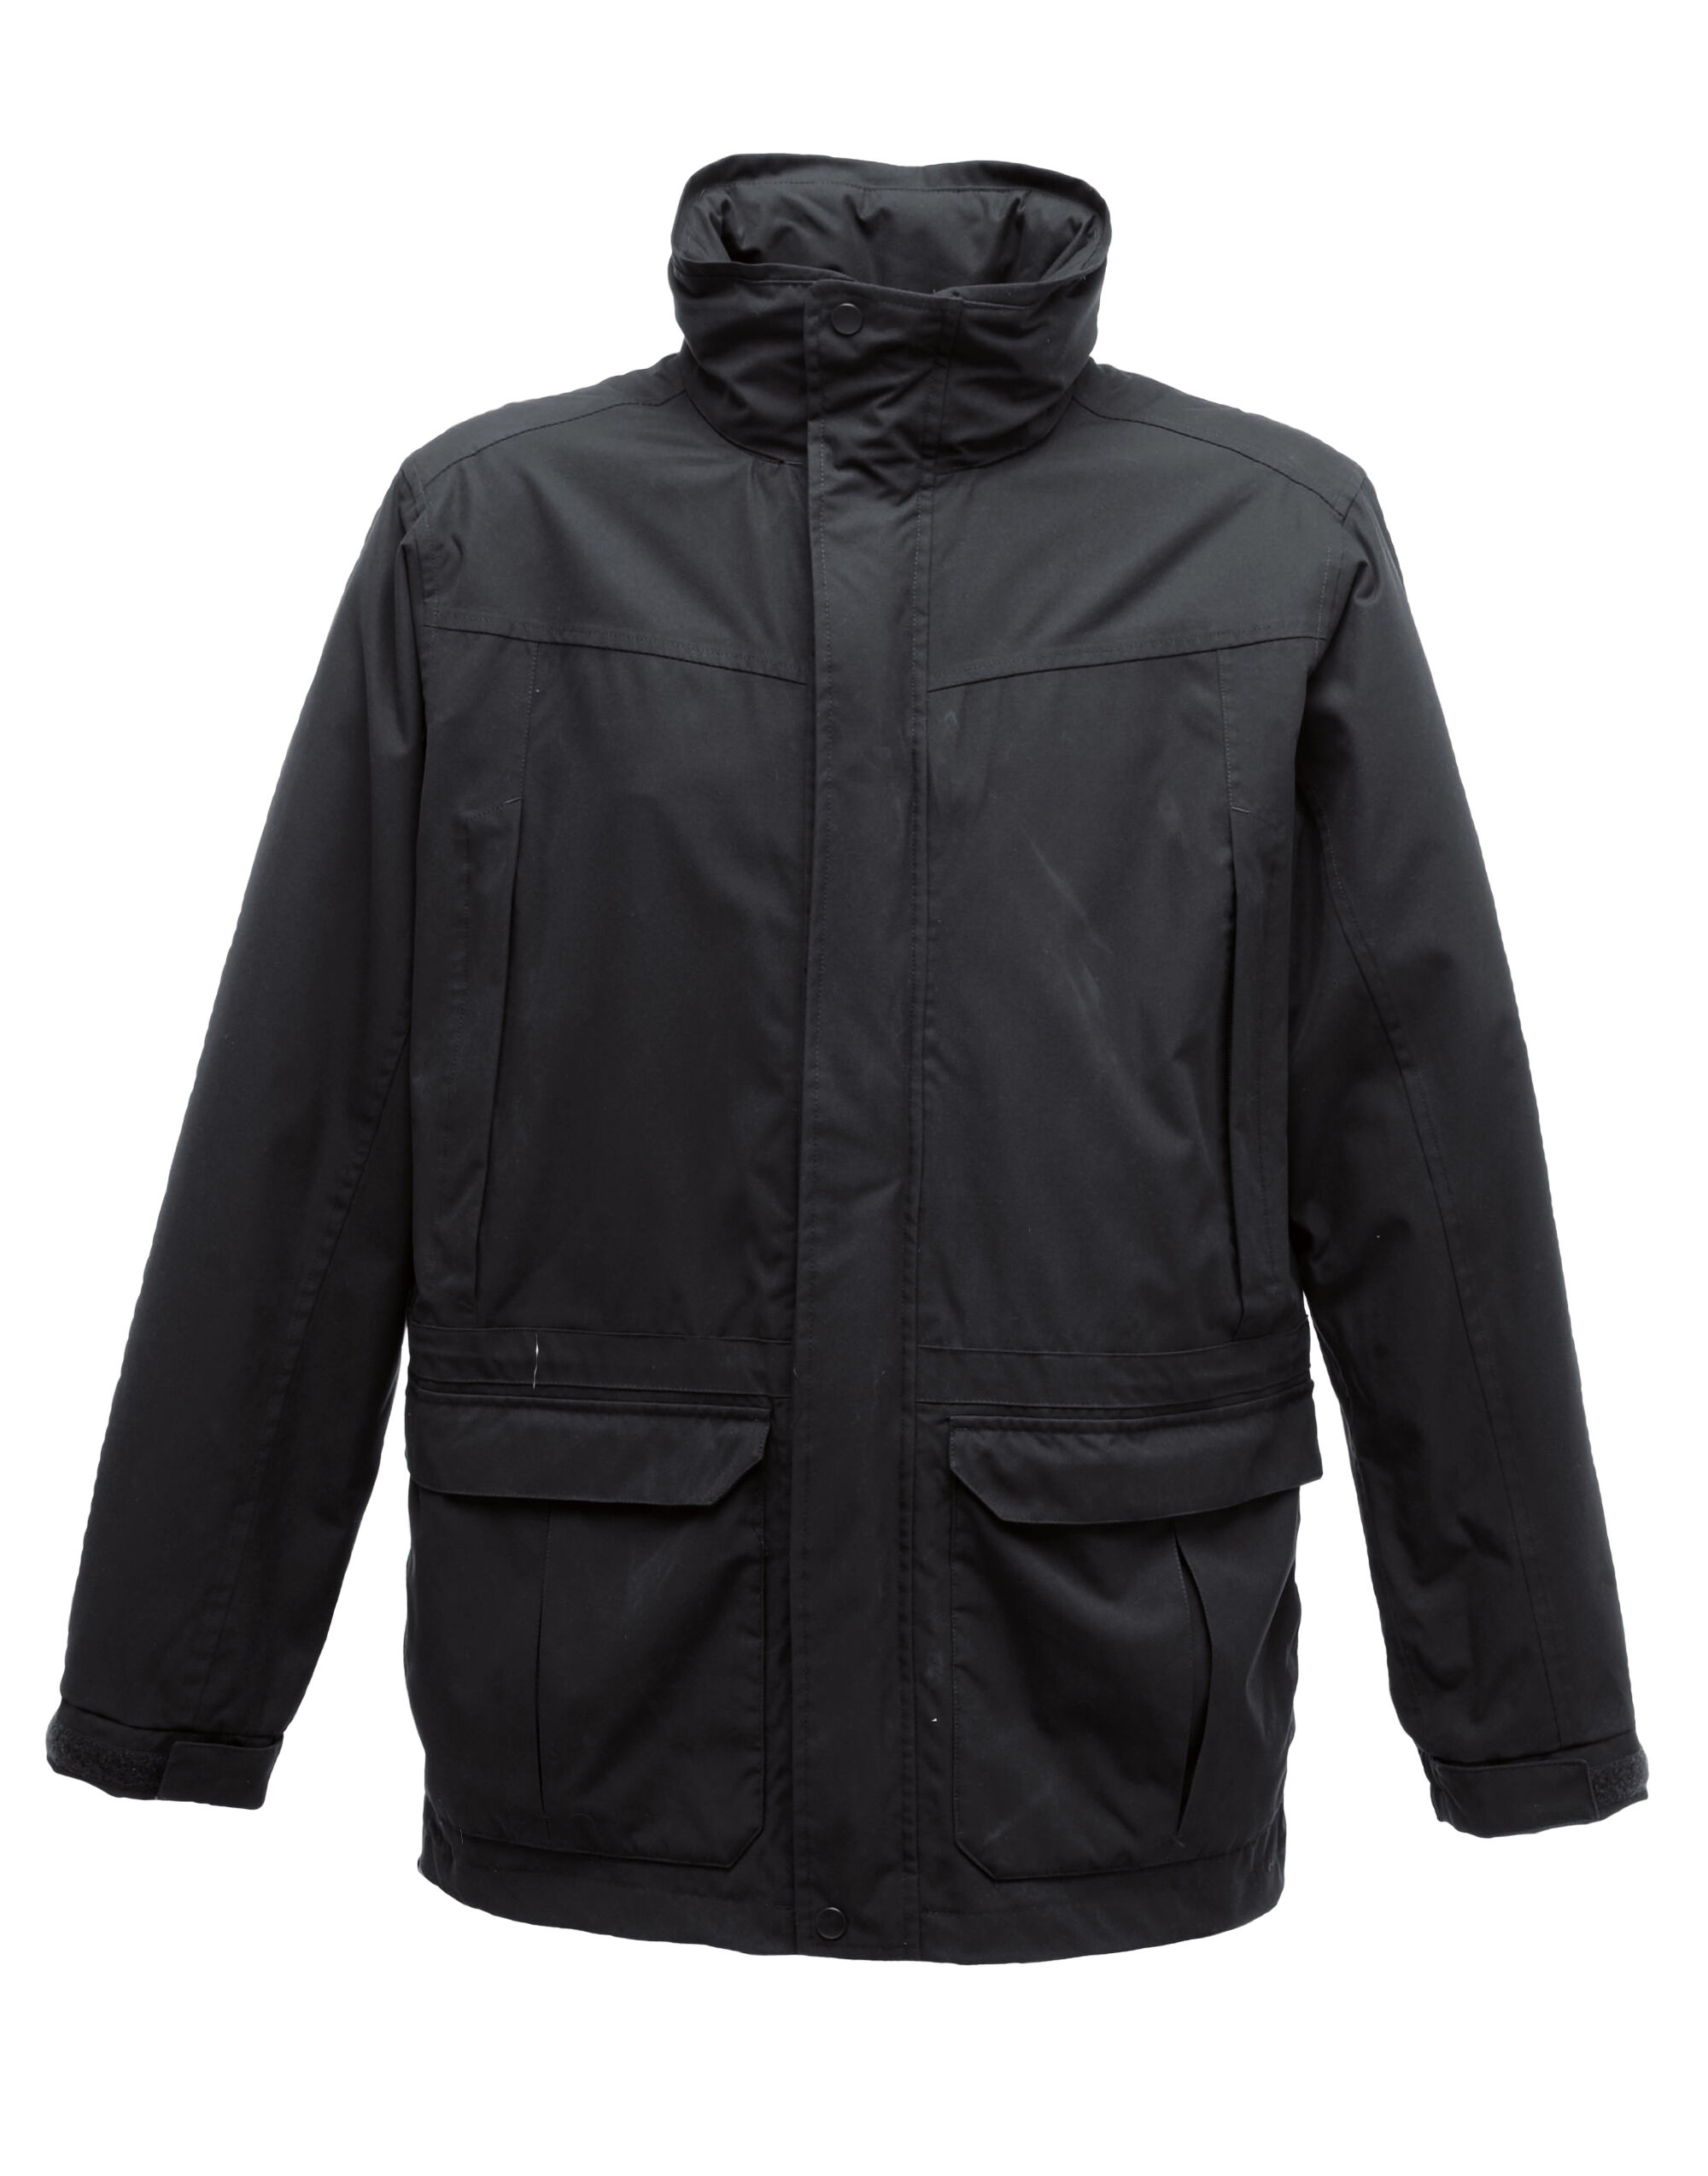 Regatta Vertex Iii Jacket